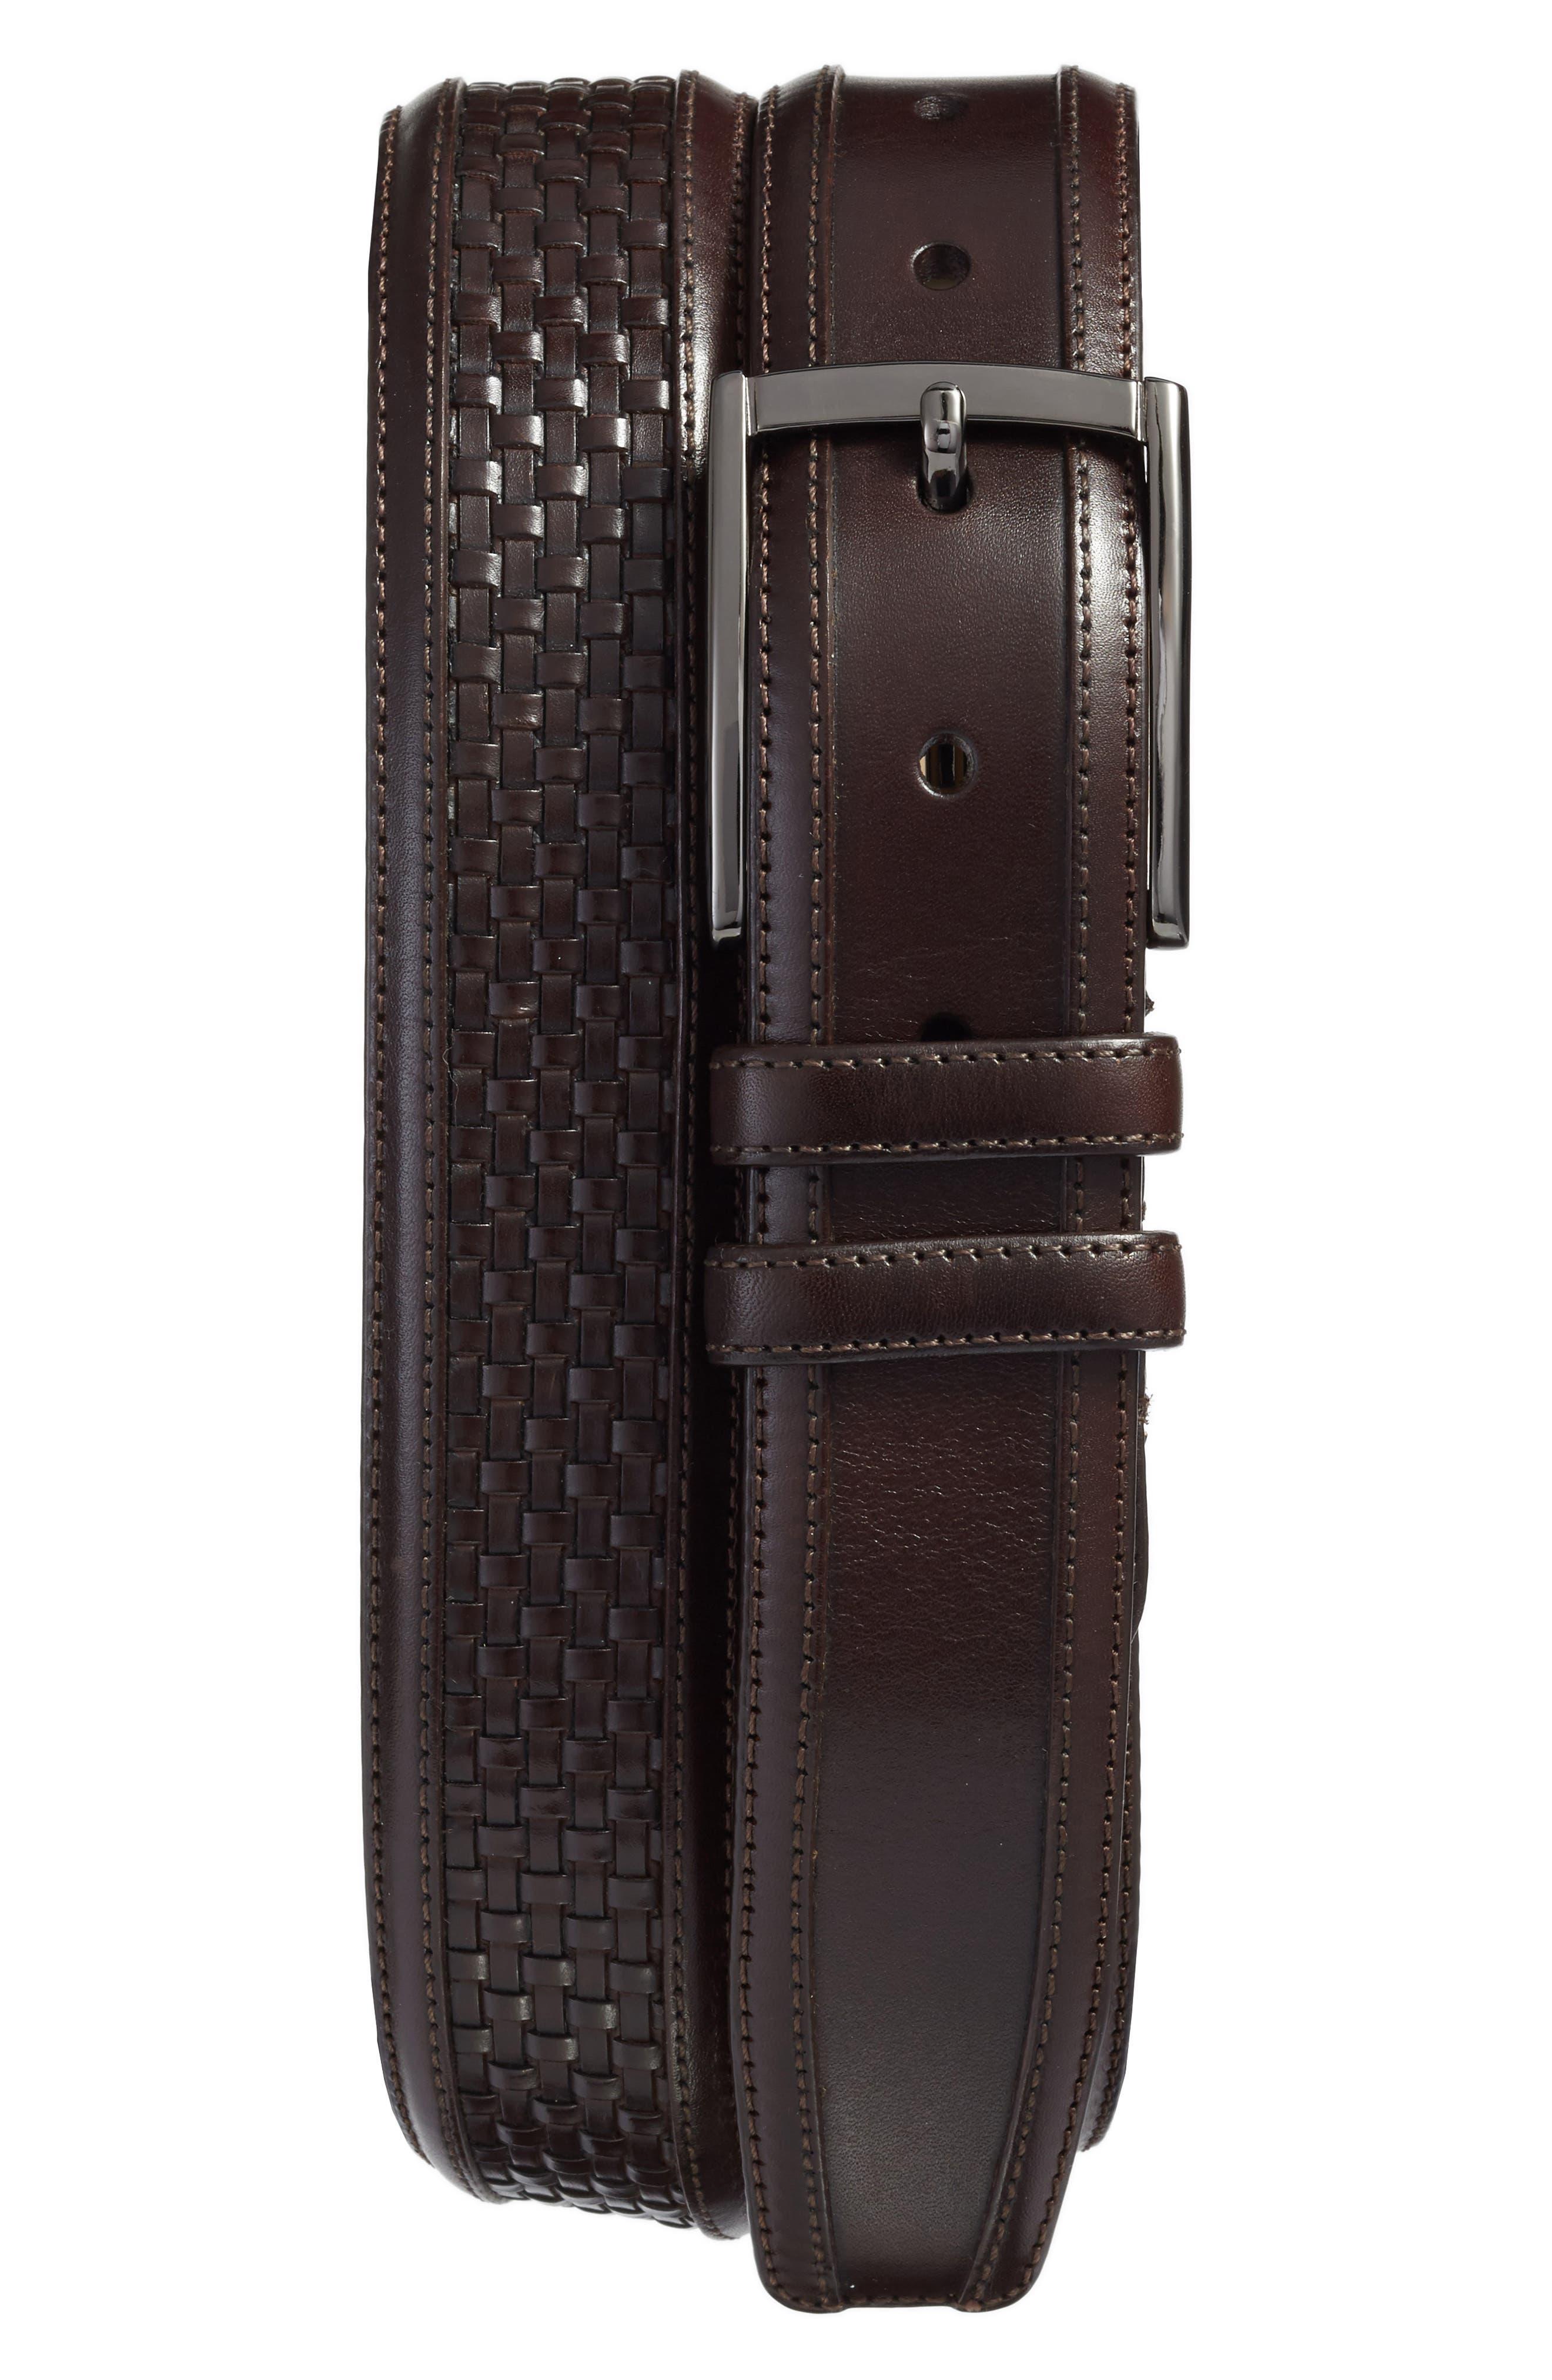 Mezlan Parma Woven Leather Belt